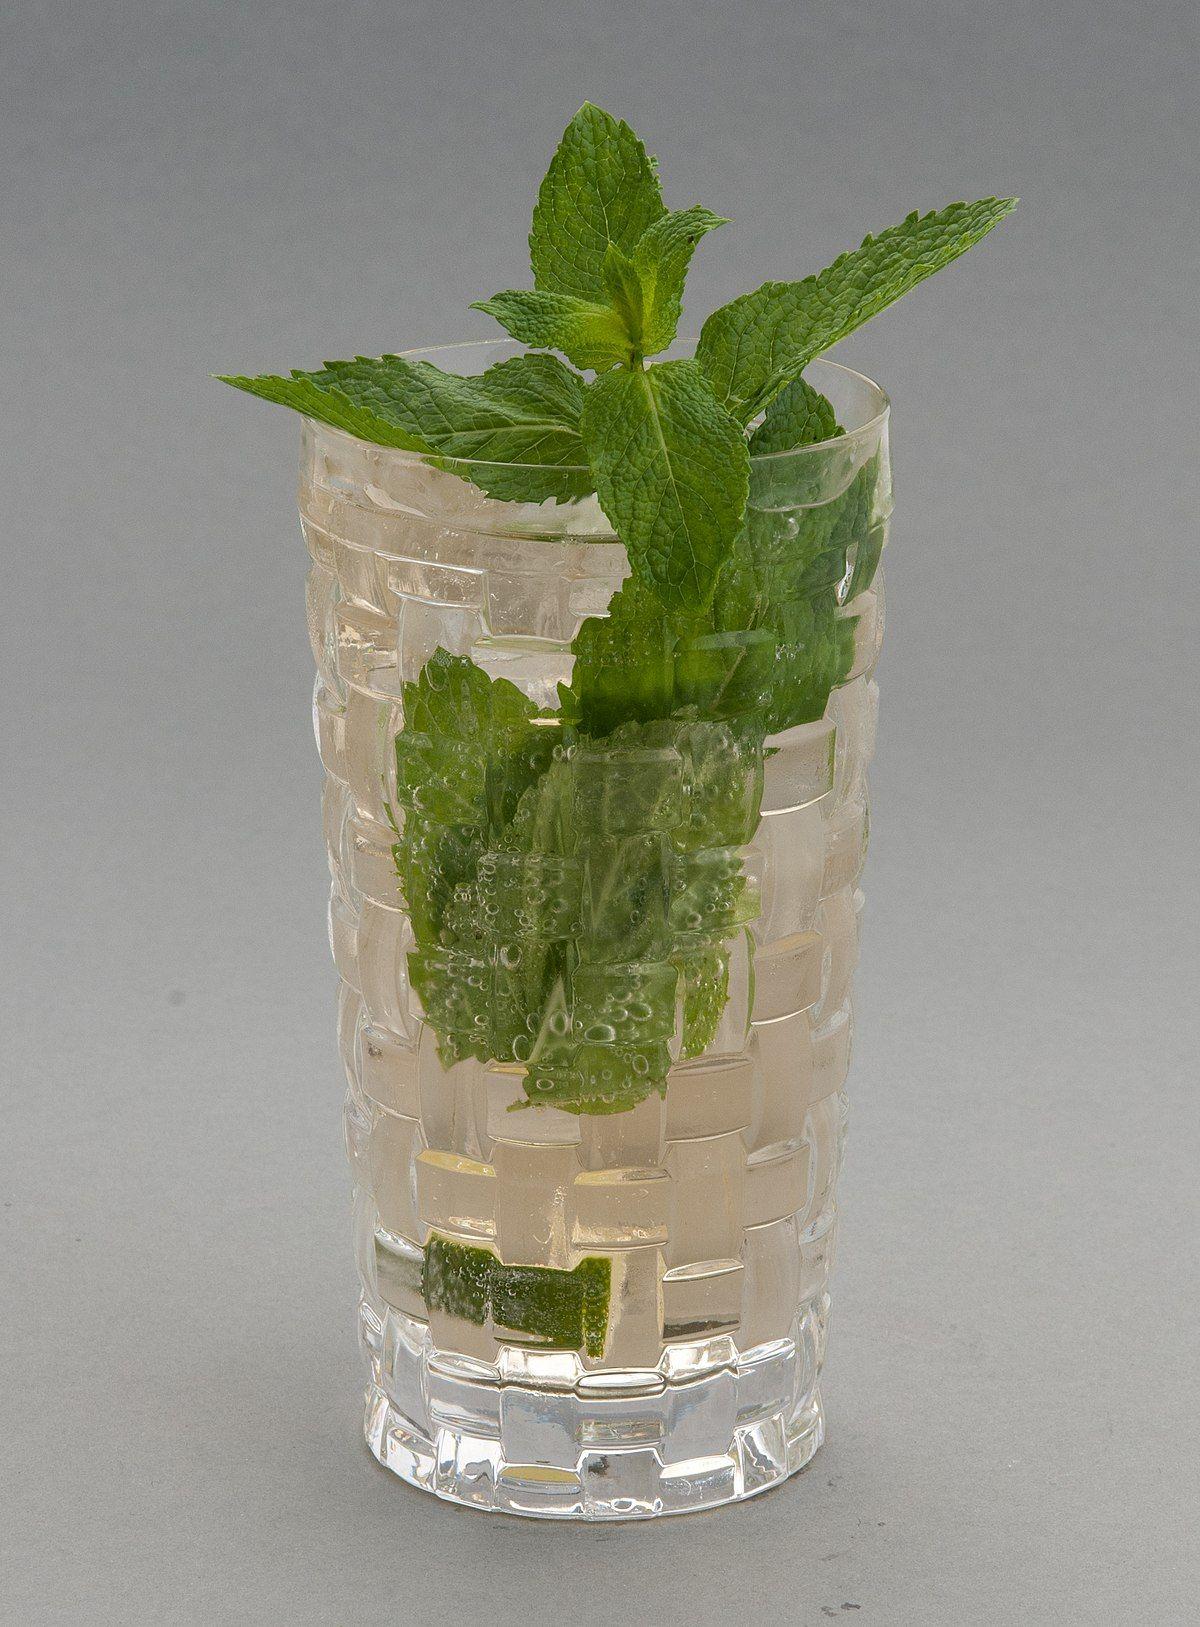 Pin Van Lisa Wert Op 090 Mojito Recept Mojito Drankjes